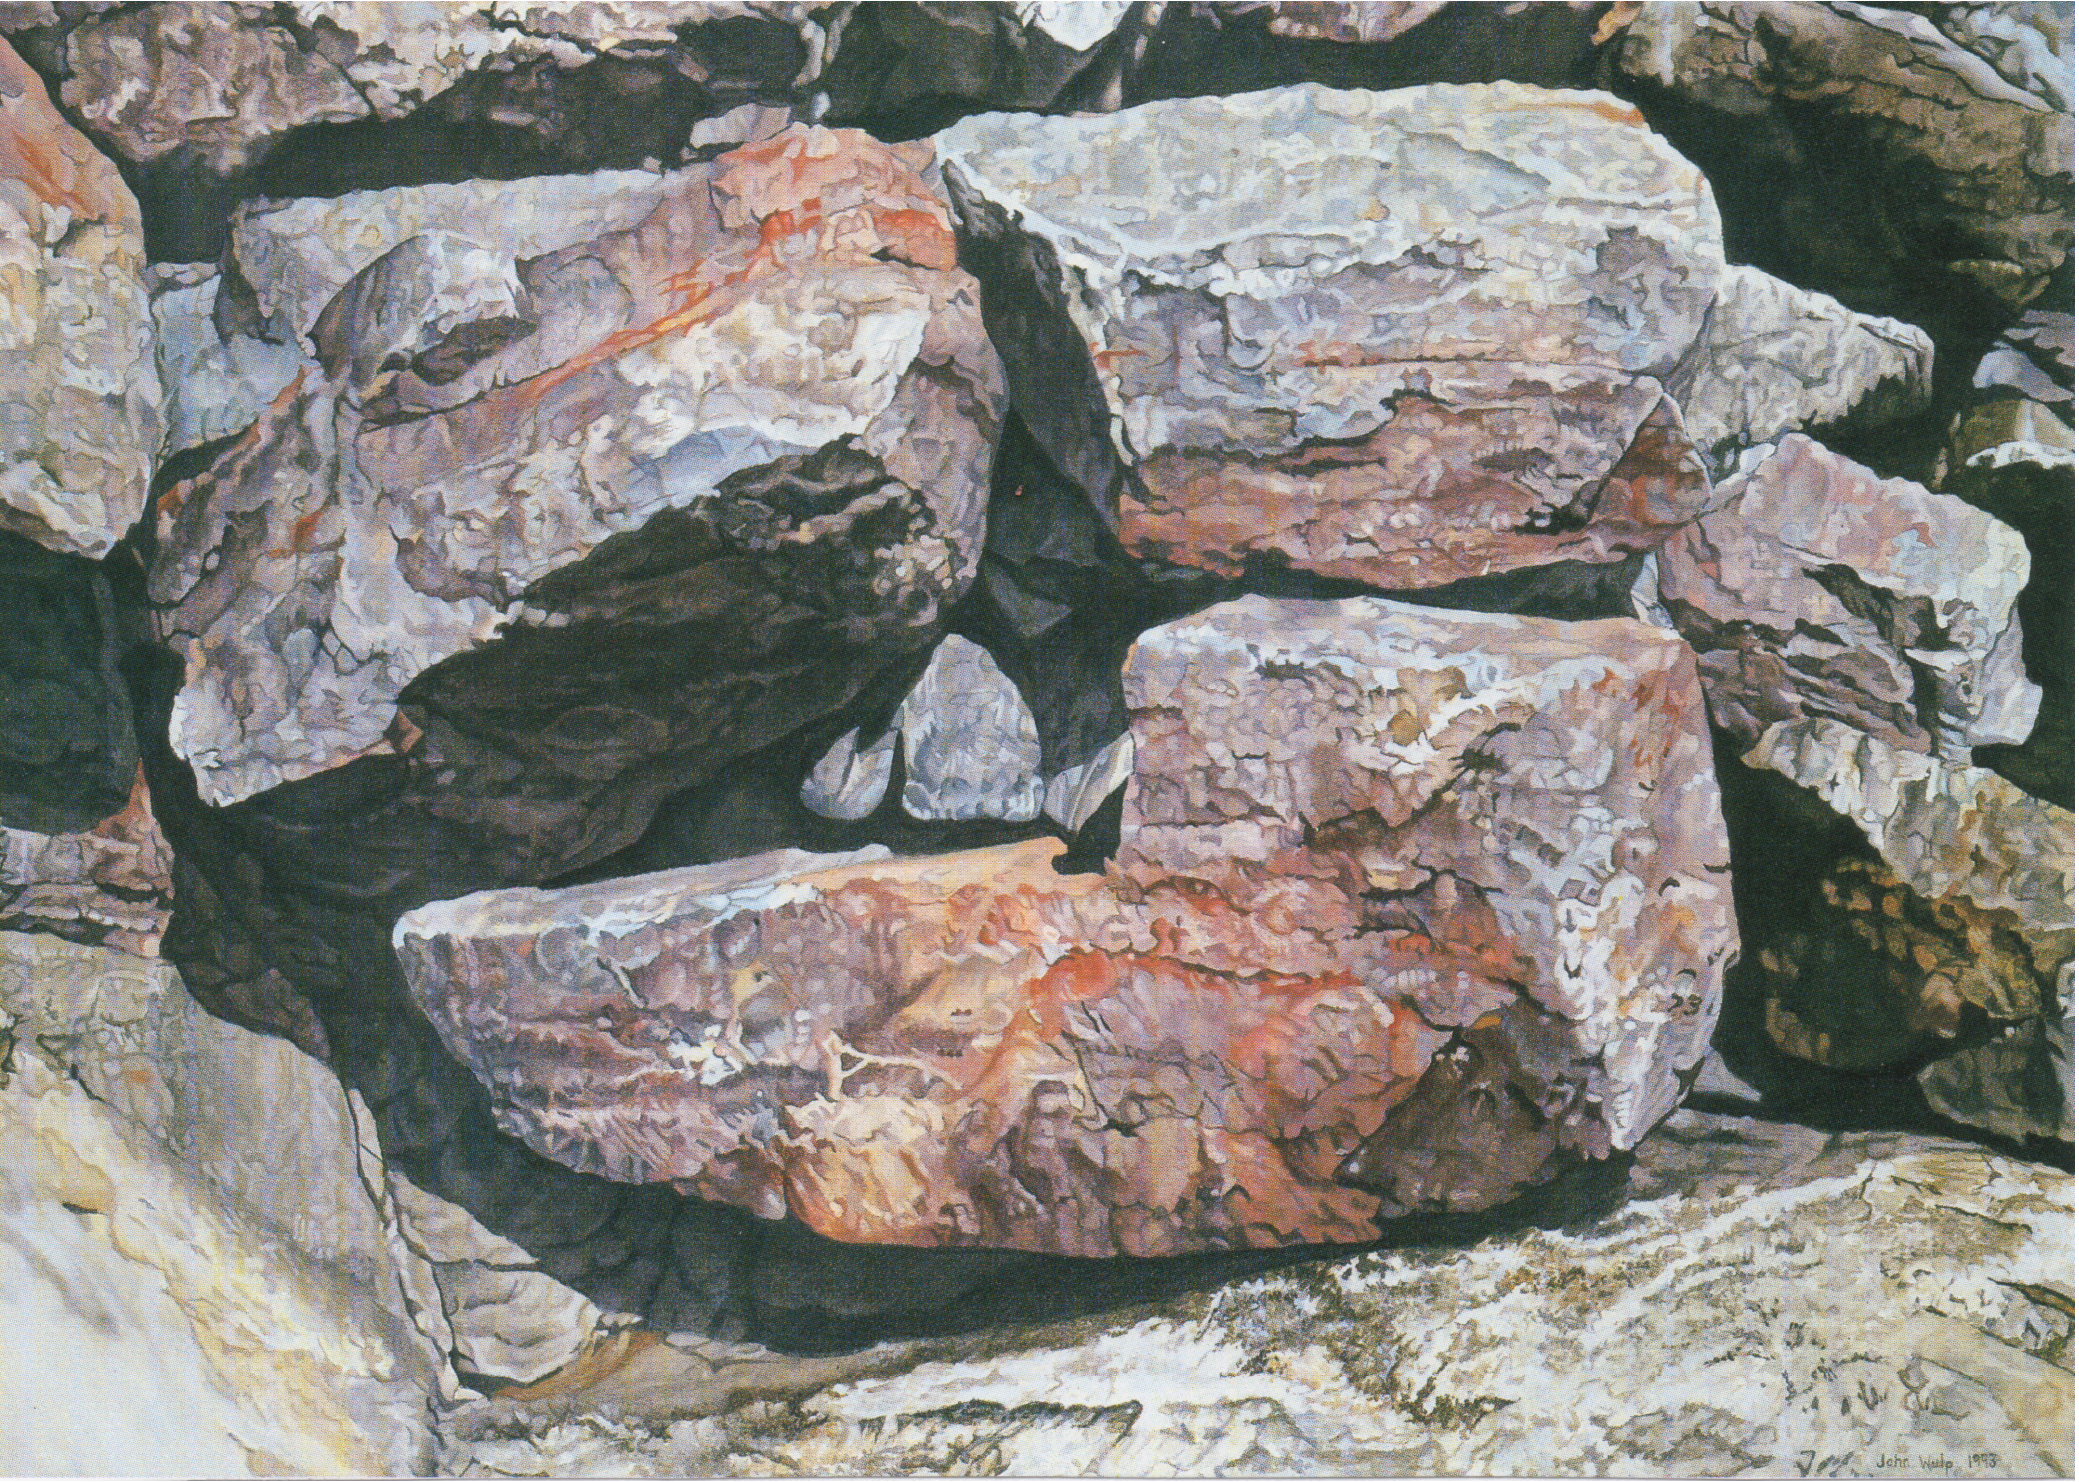 Rocks in Arey's Cove II